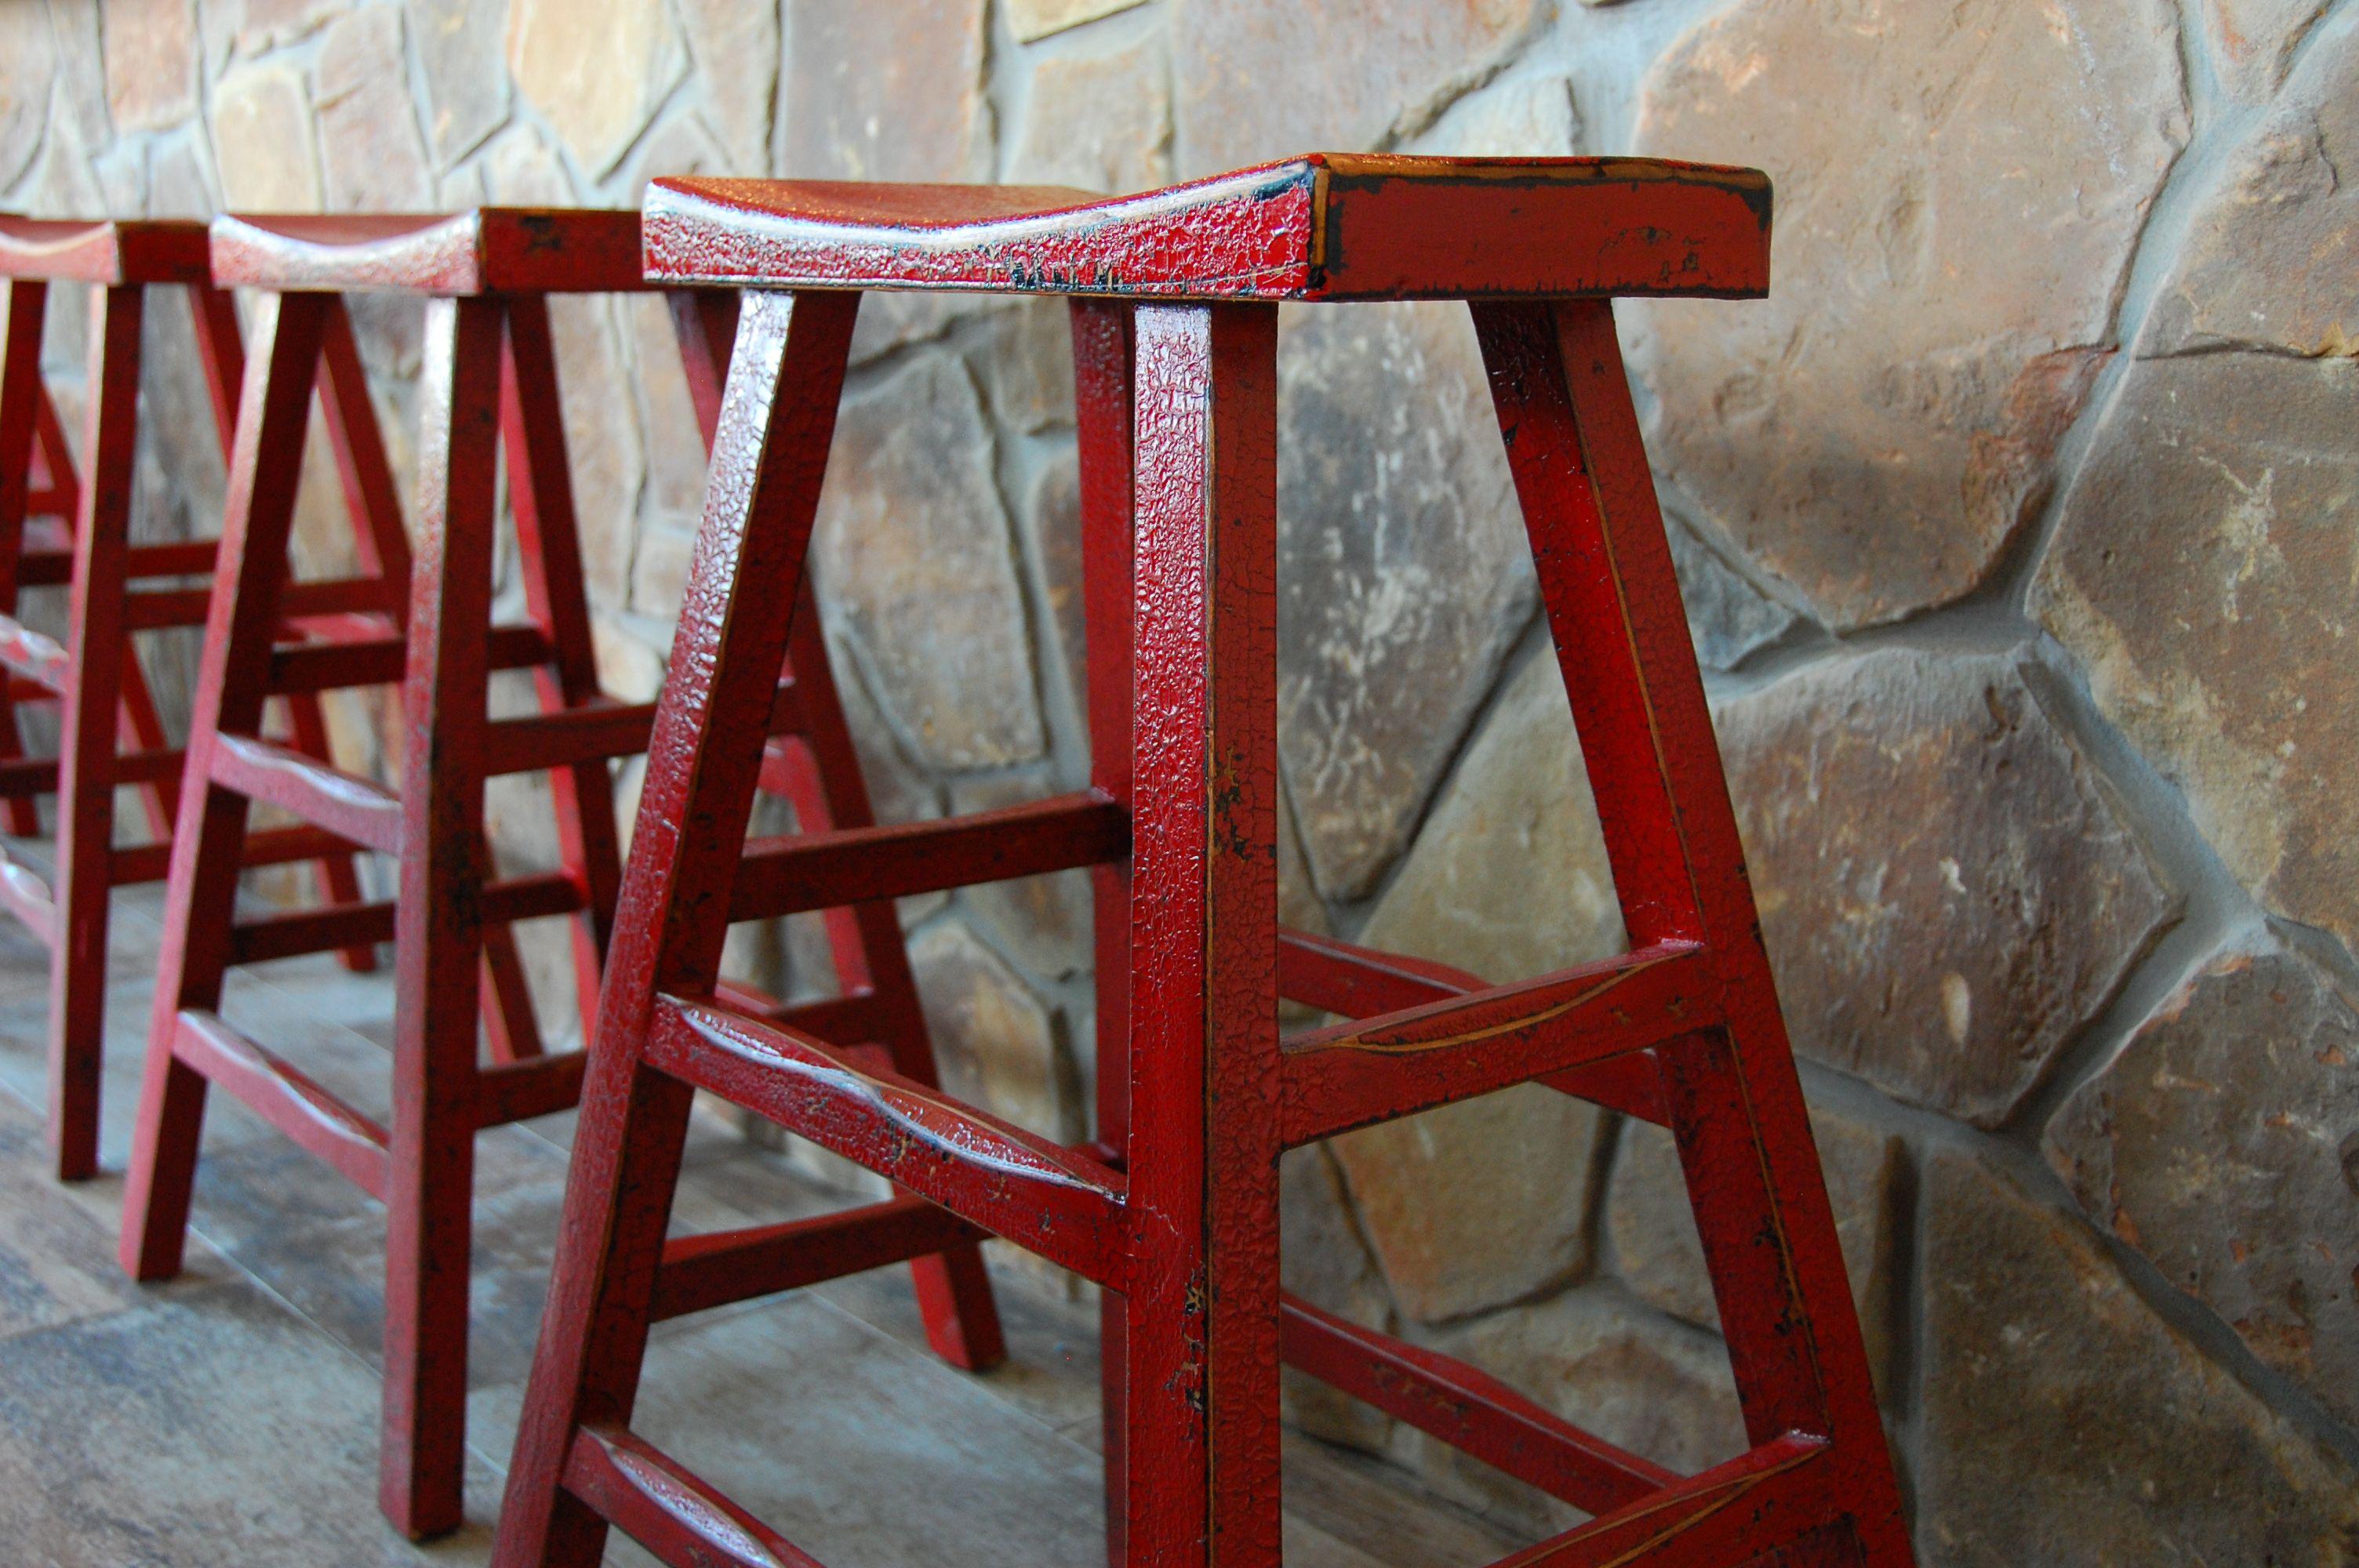 Red Stools Texas Decor Western Decor Bar Stools Rustic